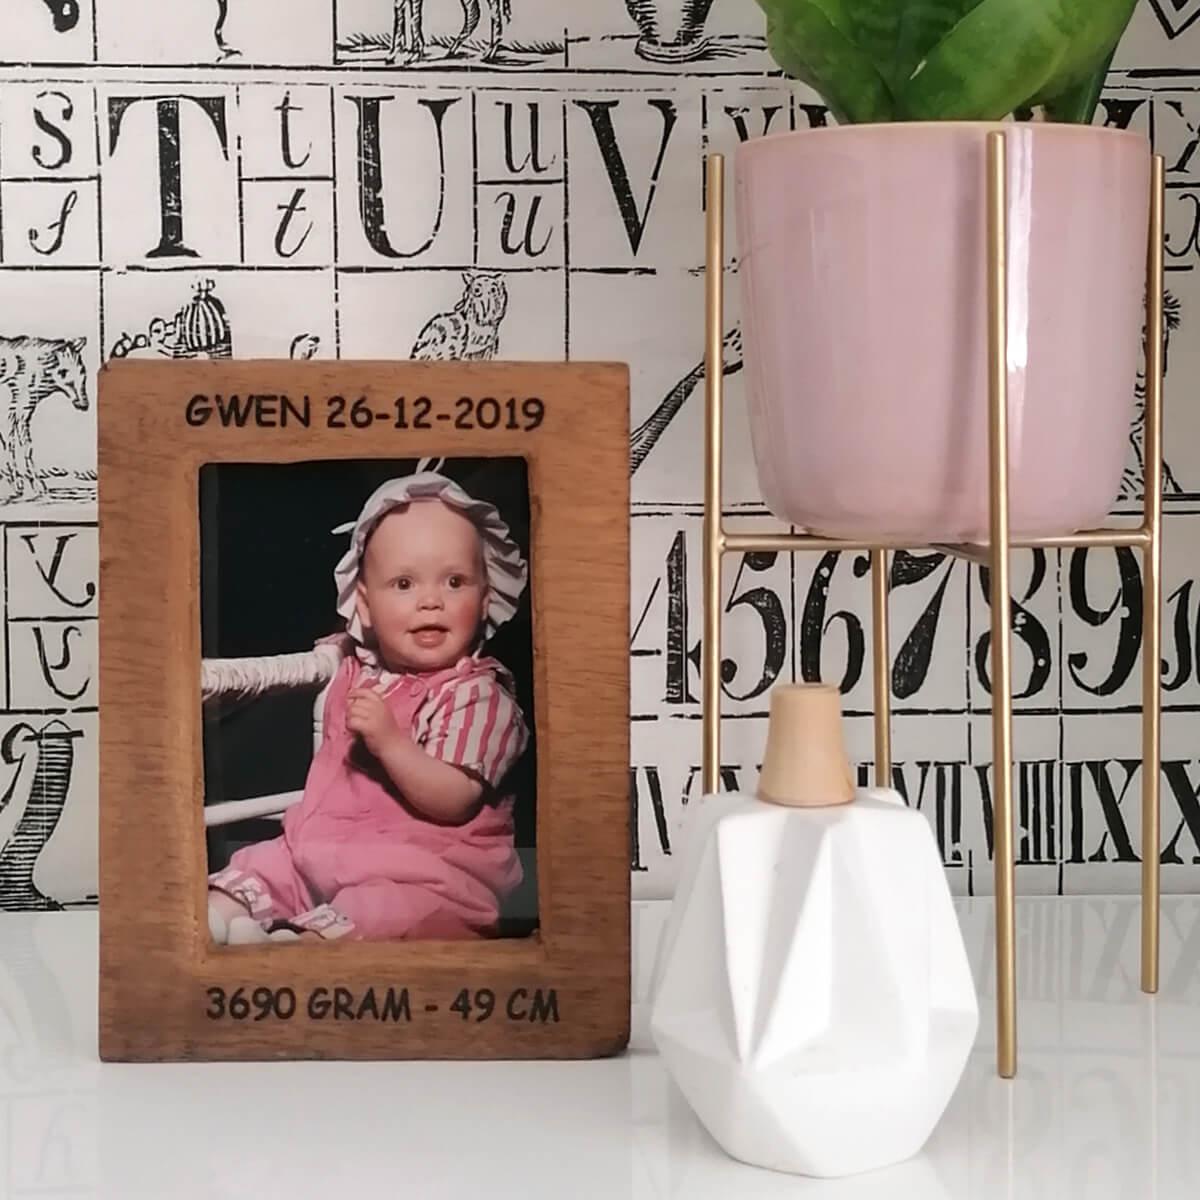 Geboortekaartje in houten fotolijst